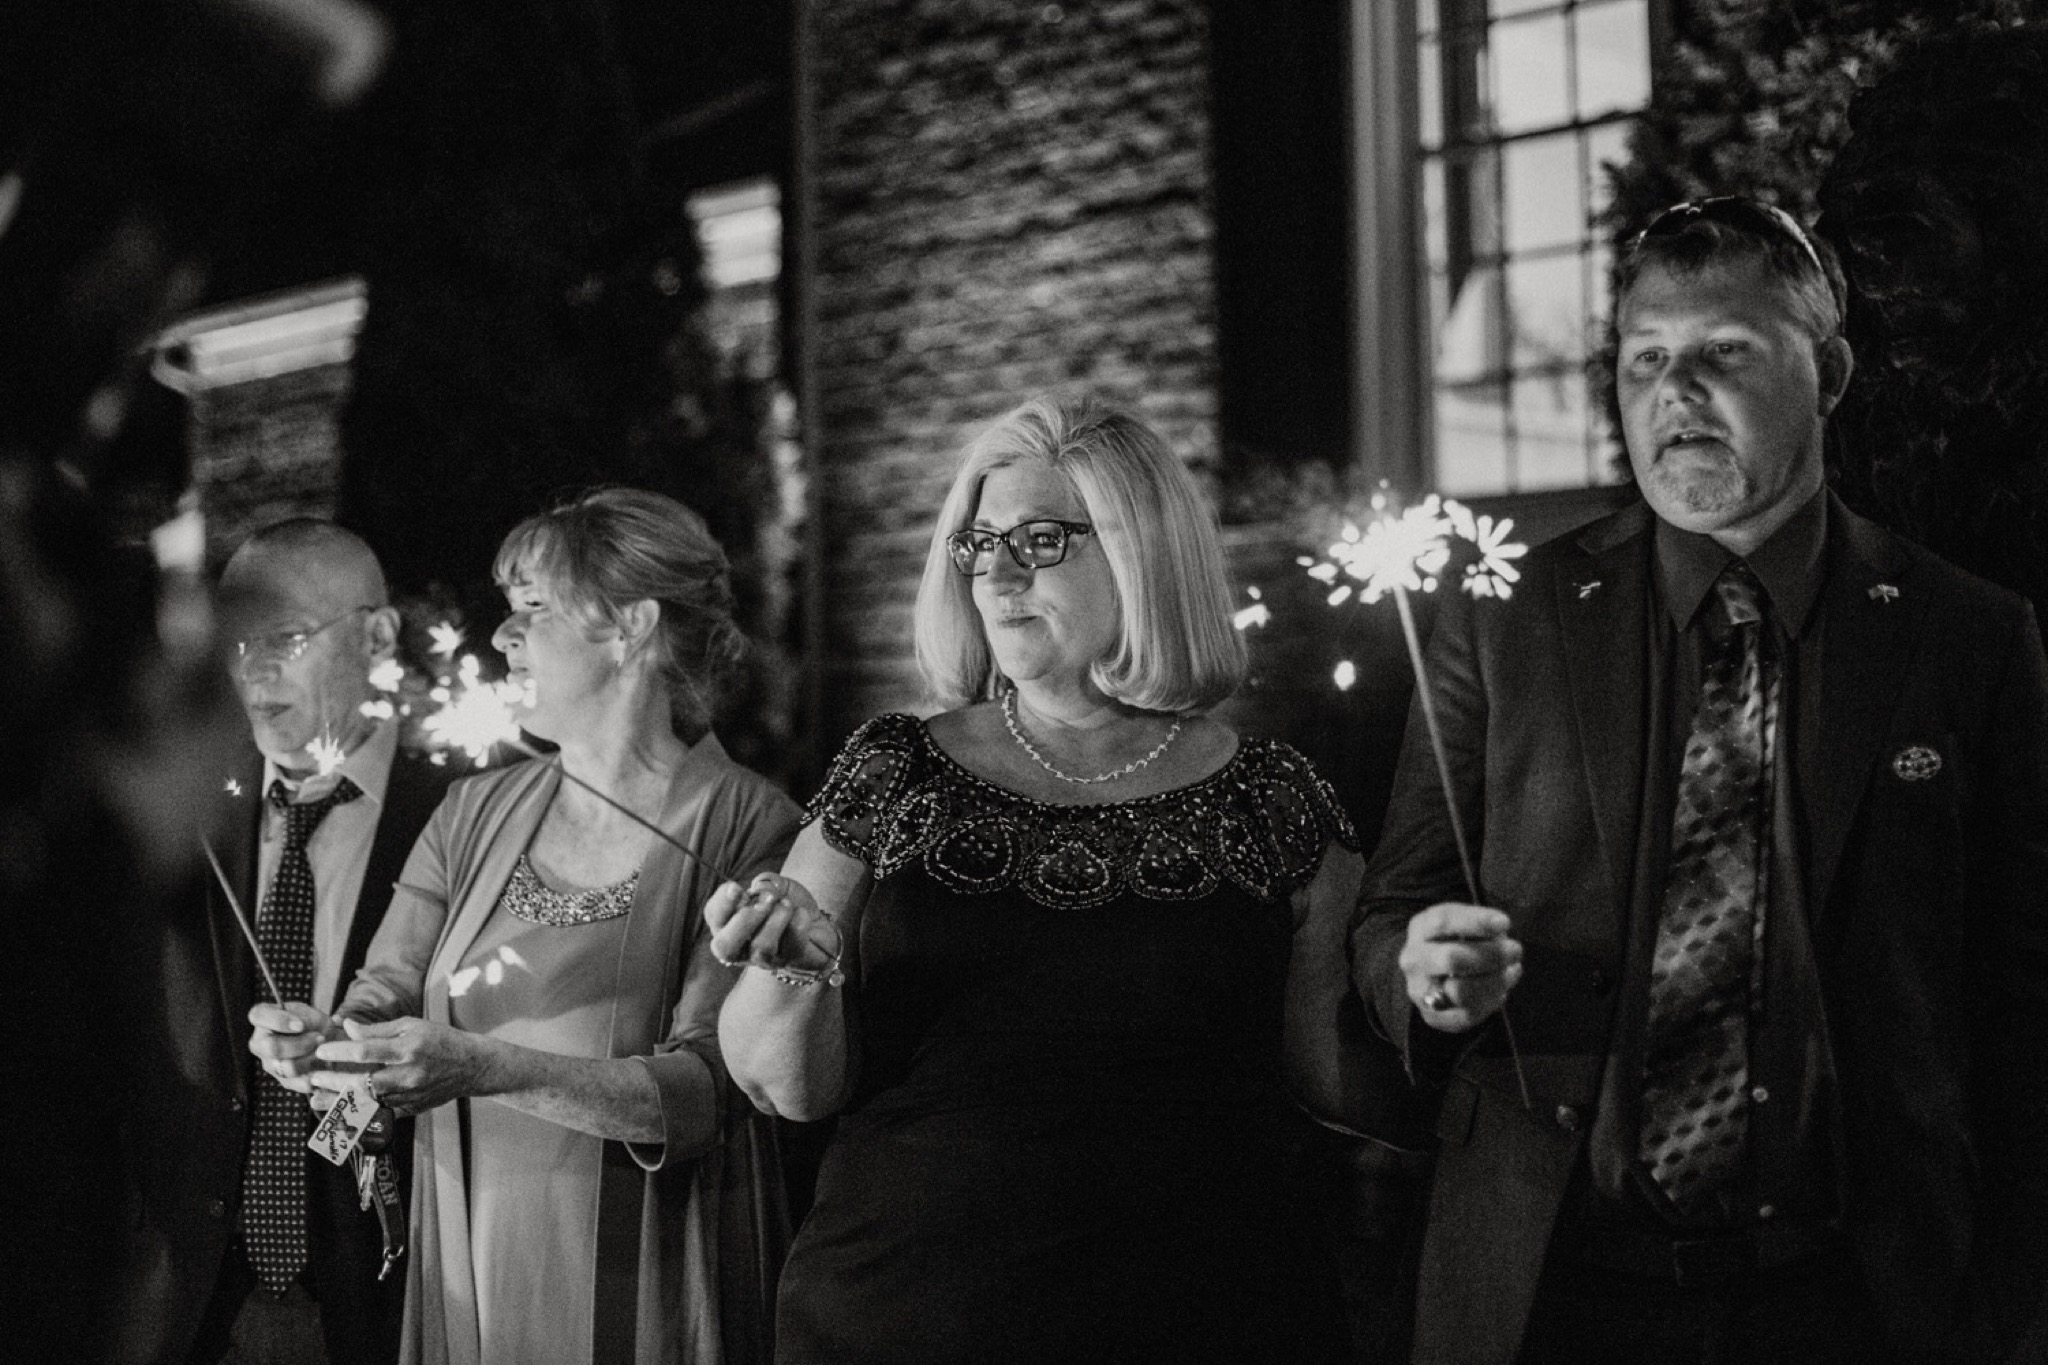 92_West Manor Estate Weddings - Pat Cori Photography-218_Sparklerexit_VirginiaWeddingPhotographer_WestManorEstate_Weddingvenue_Virginia.jpg